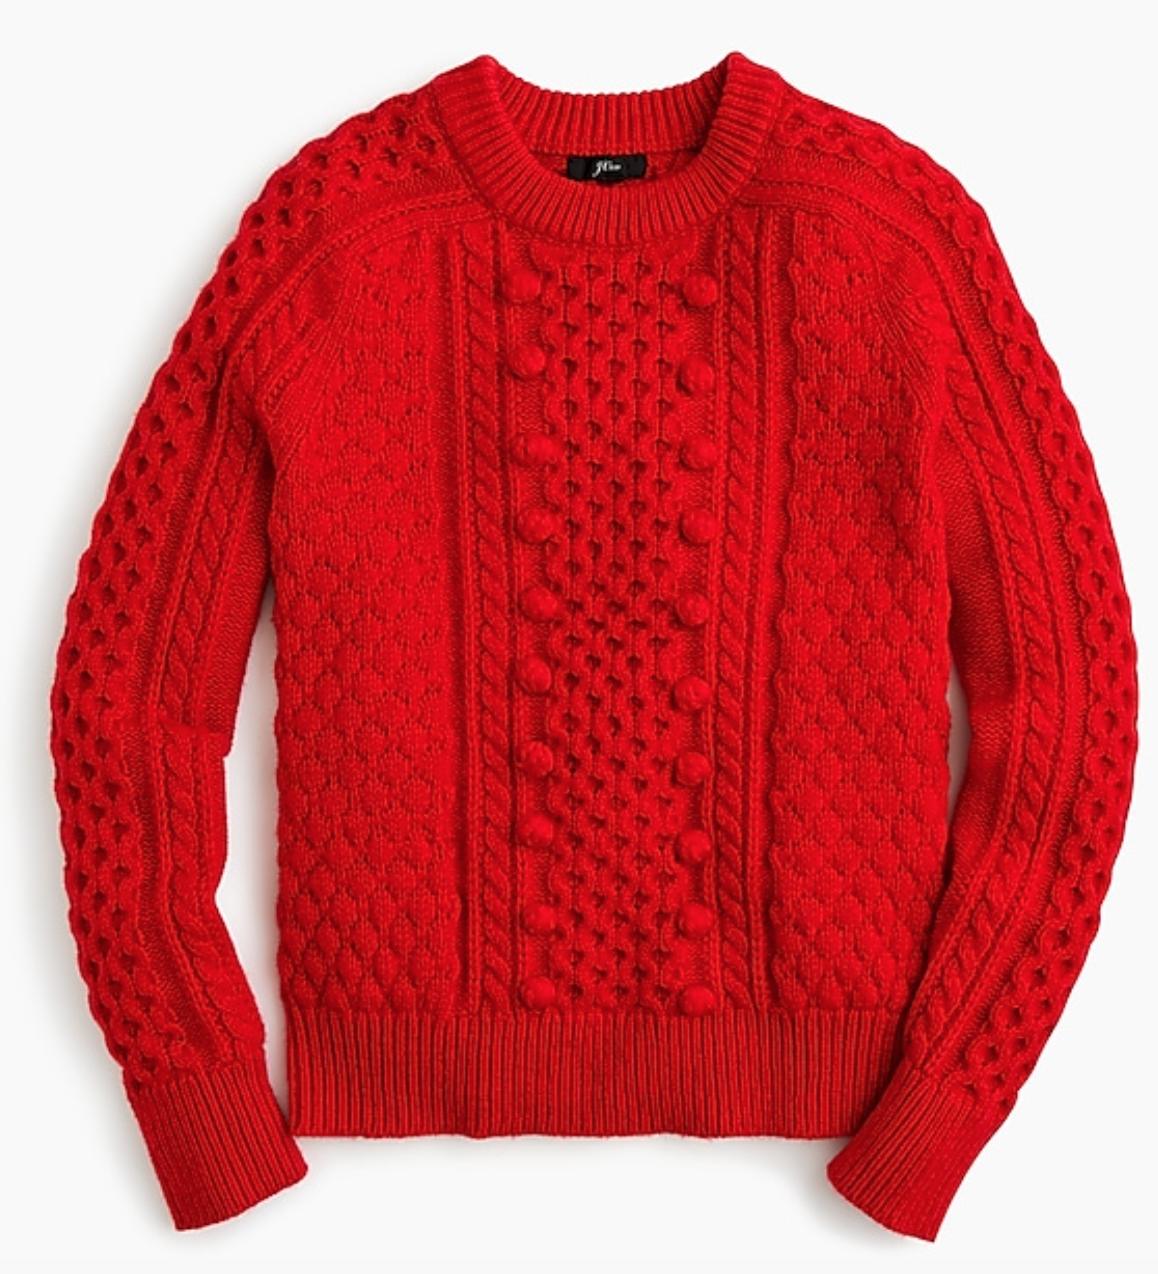 J.Crew: Popcorn Sweater